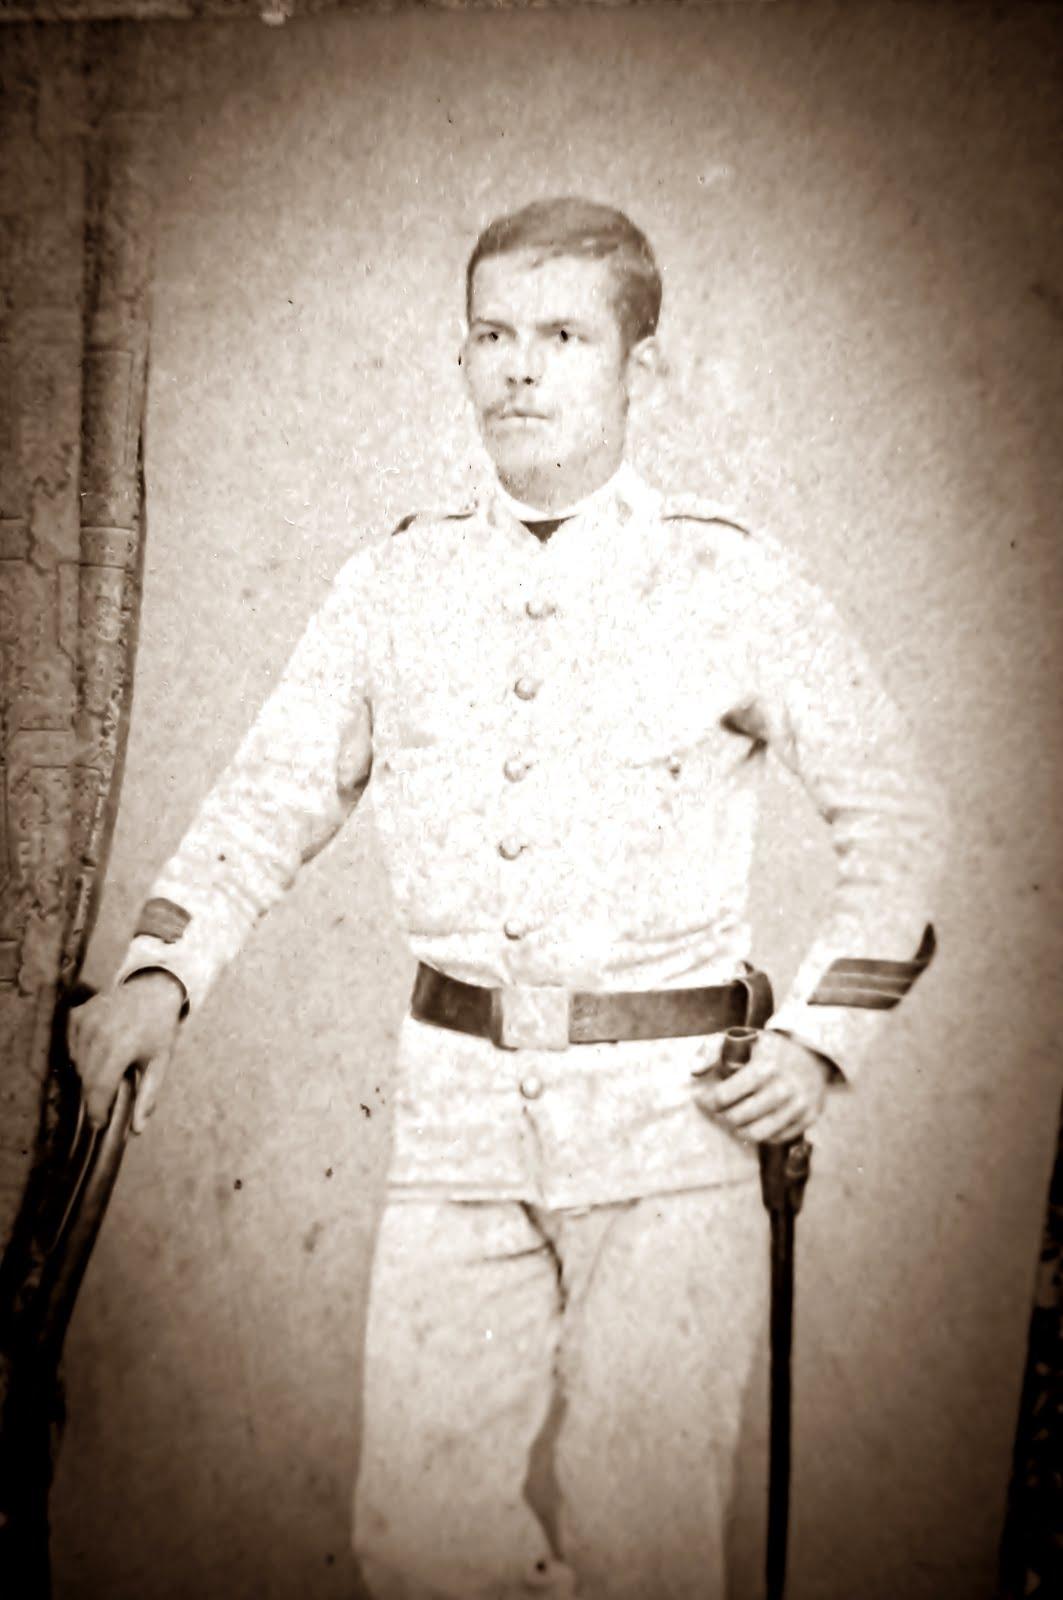 Sargento Ricardo López Fernández